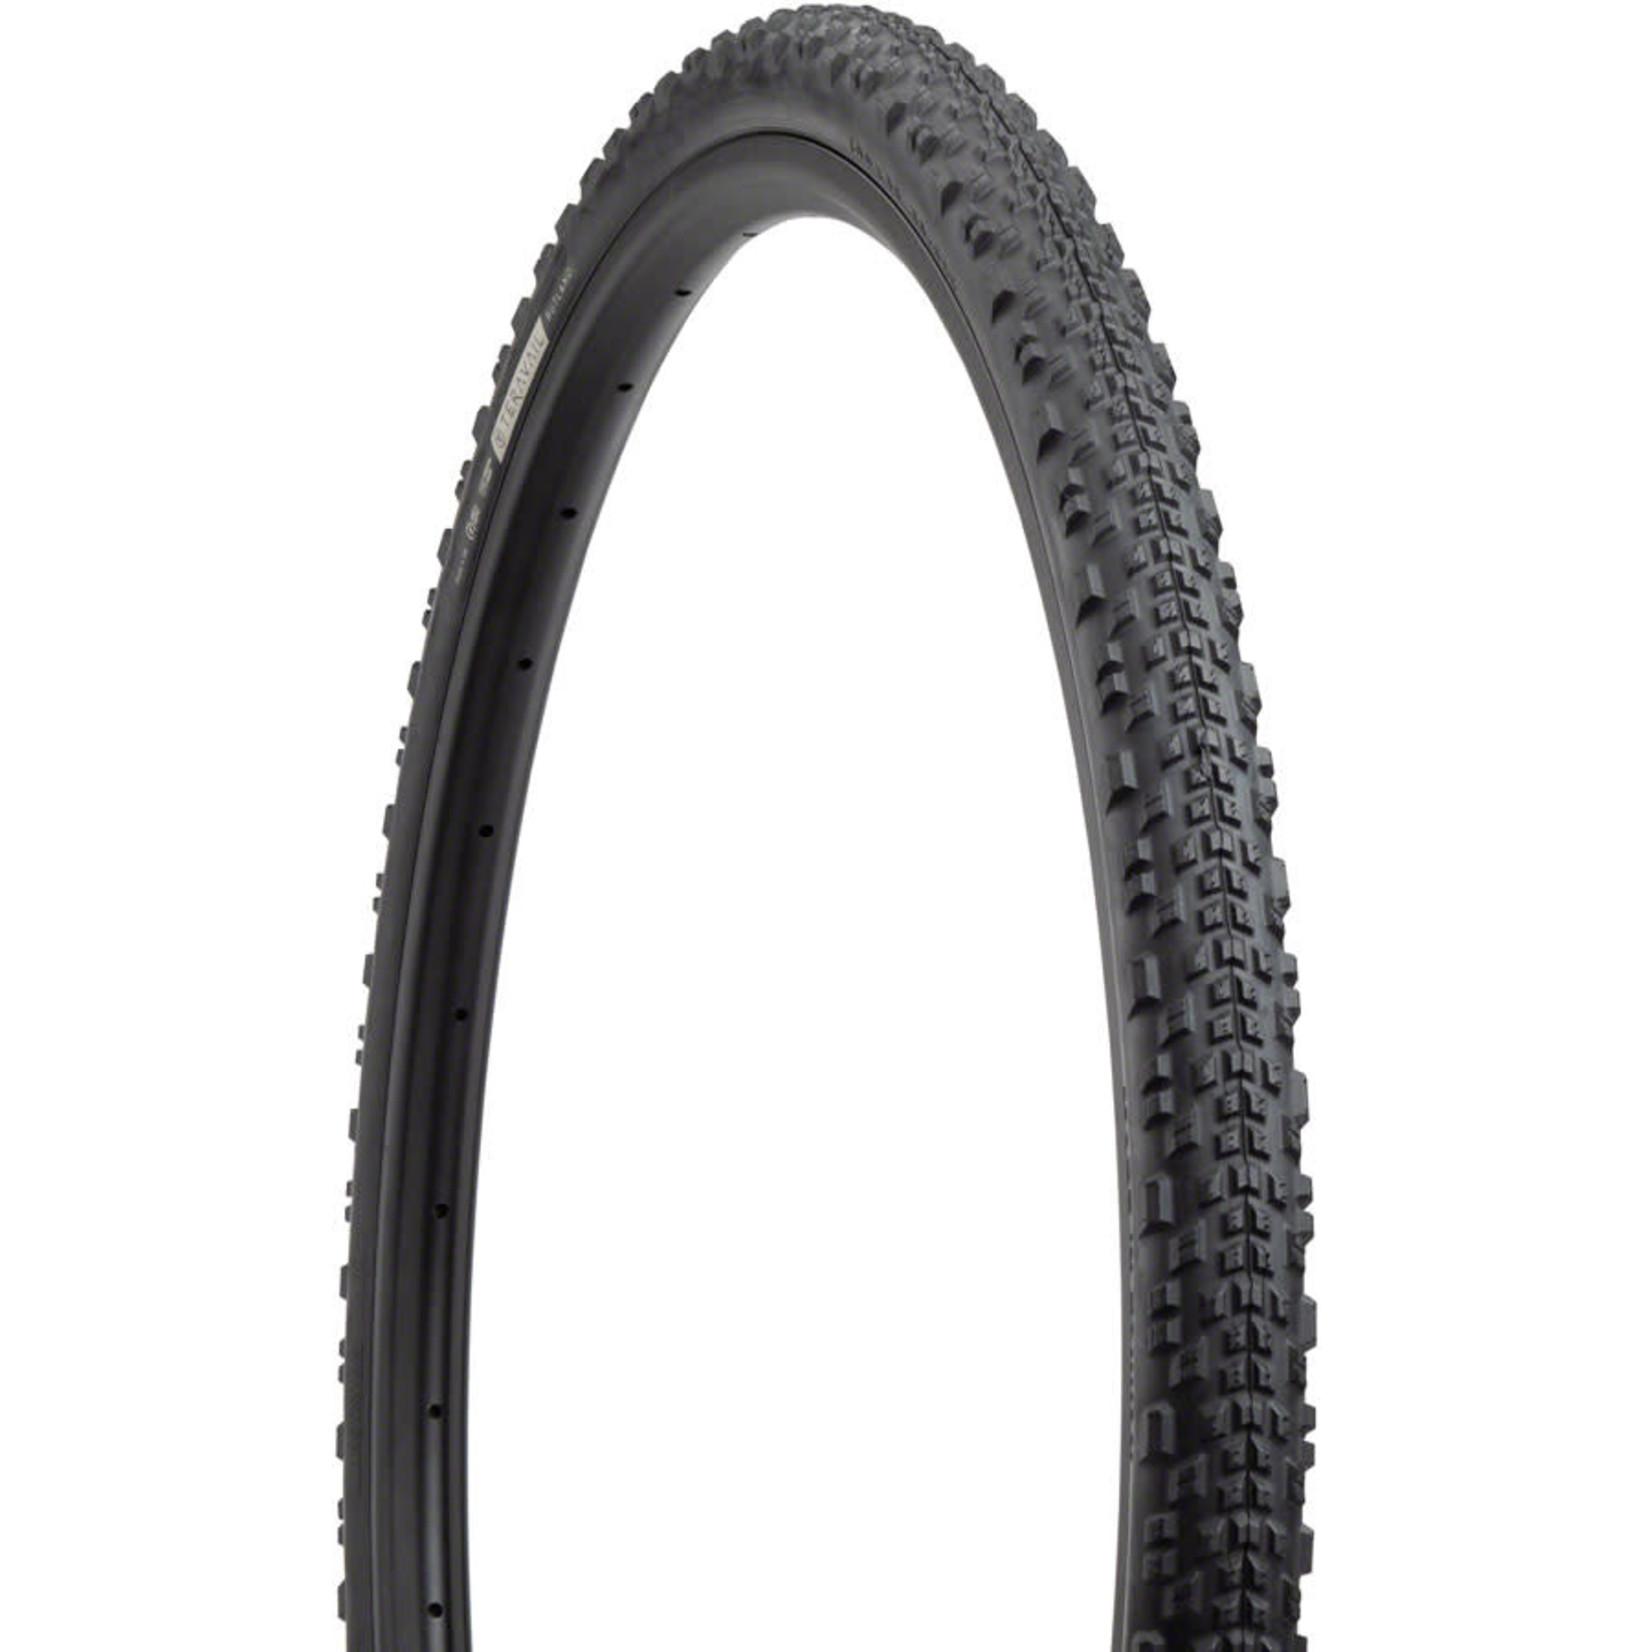 Teravail Rutland Tire - 700 x 38, Tubeless, Folding, Black, Light and Supple